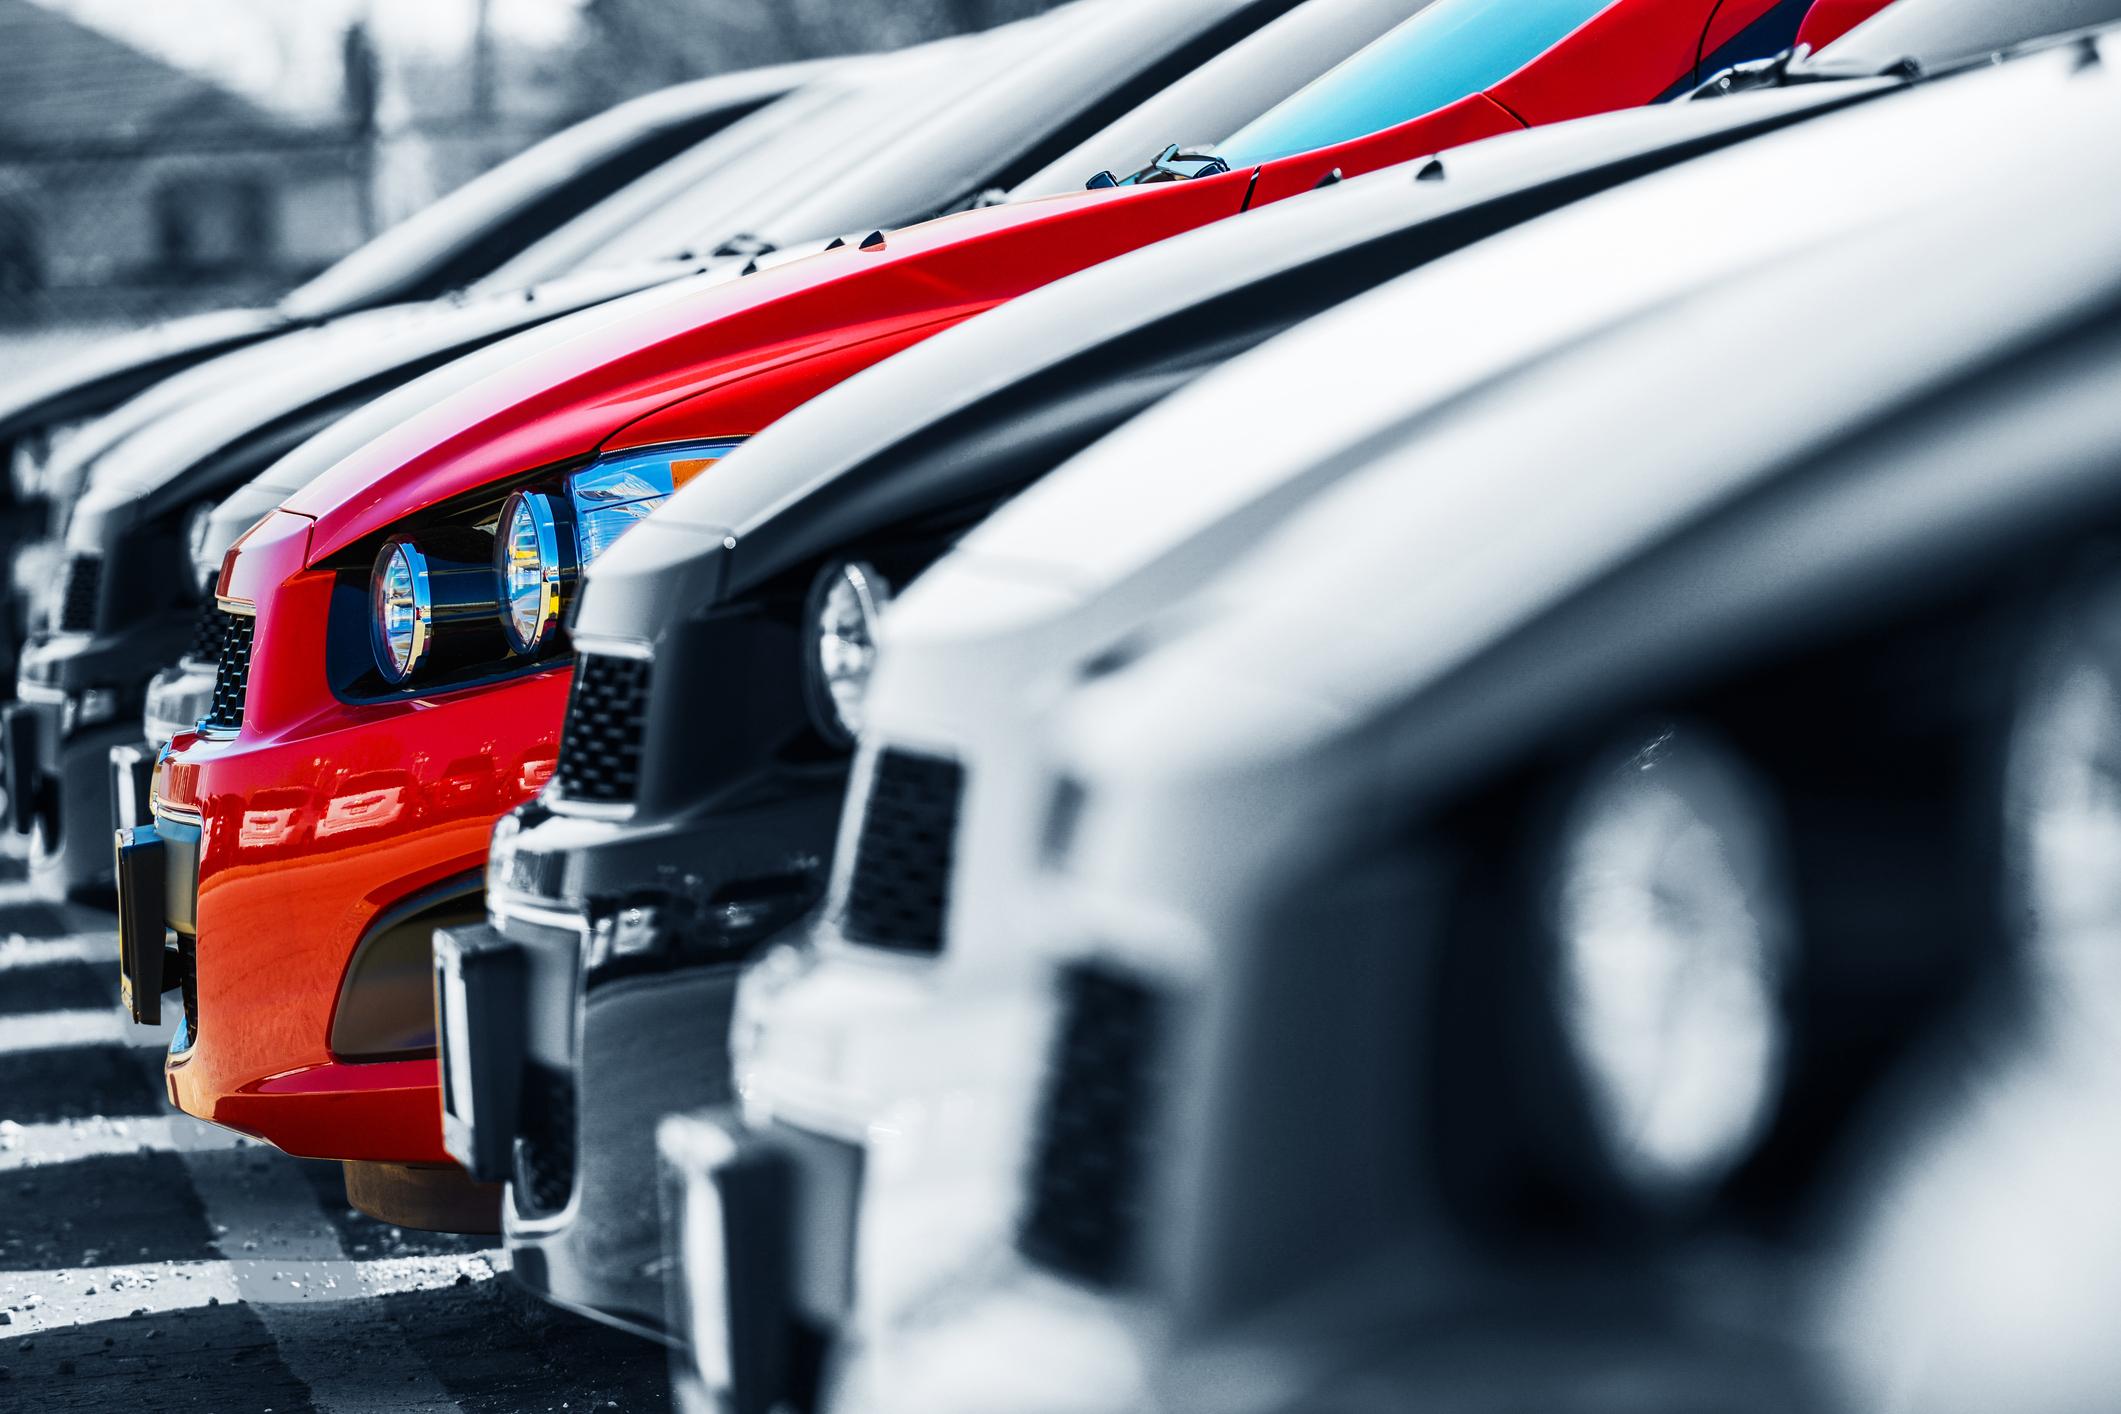 Row of new cars at a dealership.